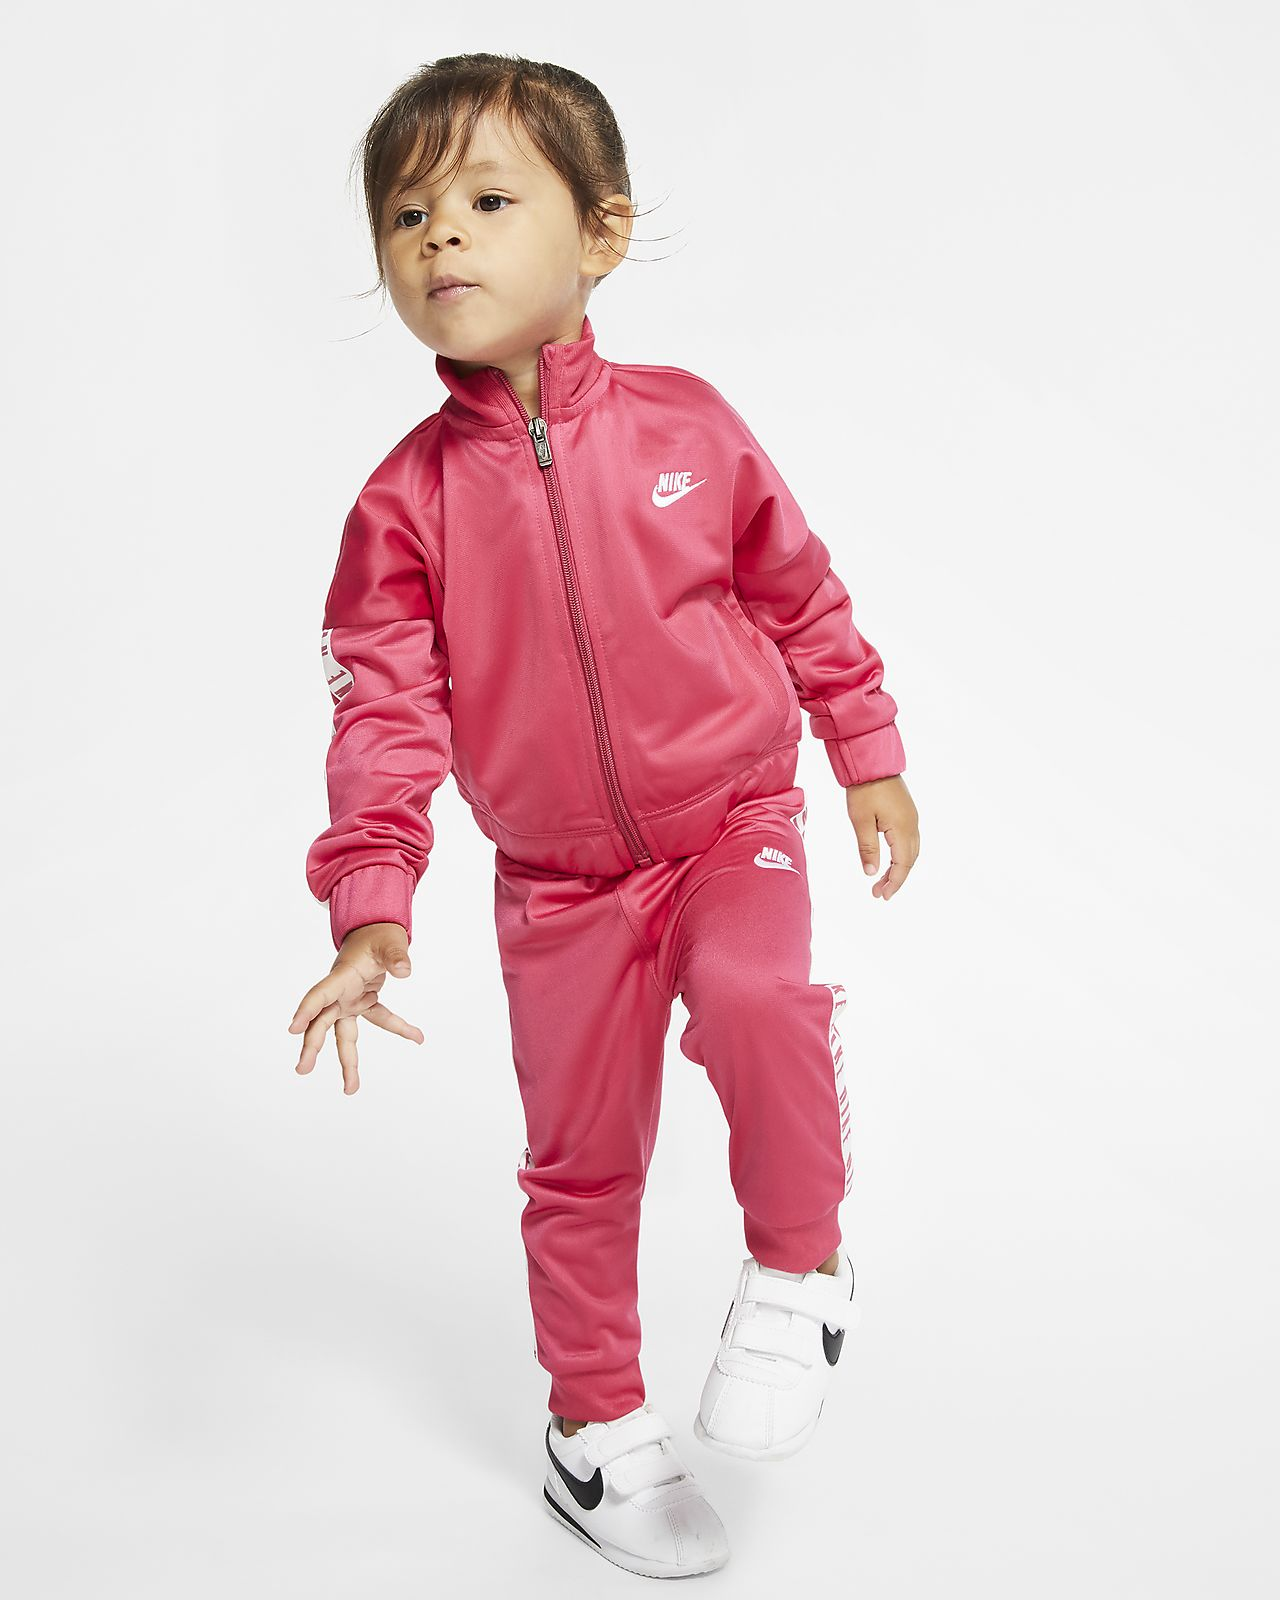 Nike Sportswear Baby (12-24M) Tracksuit Set